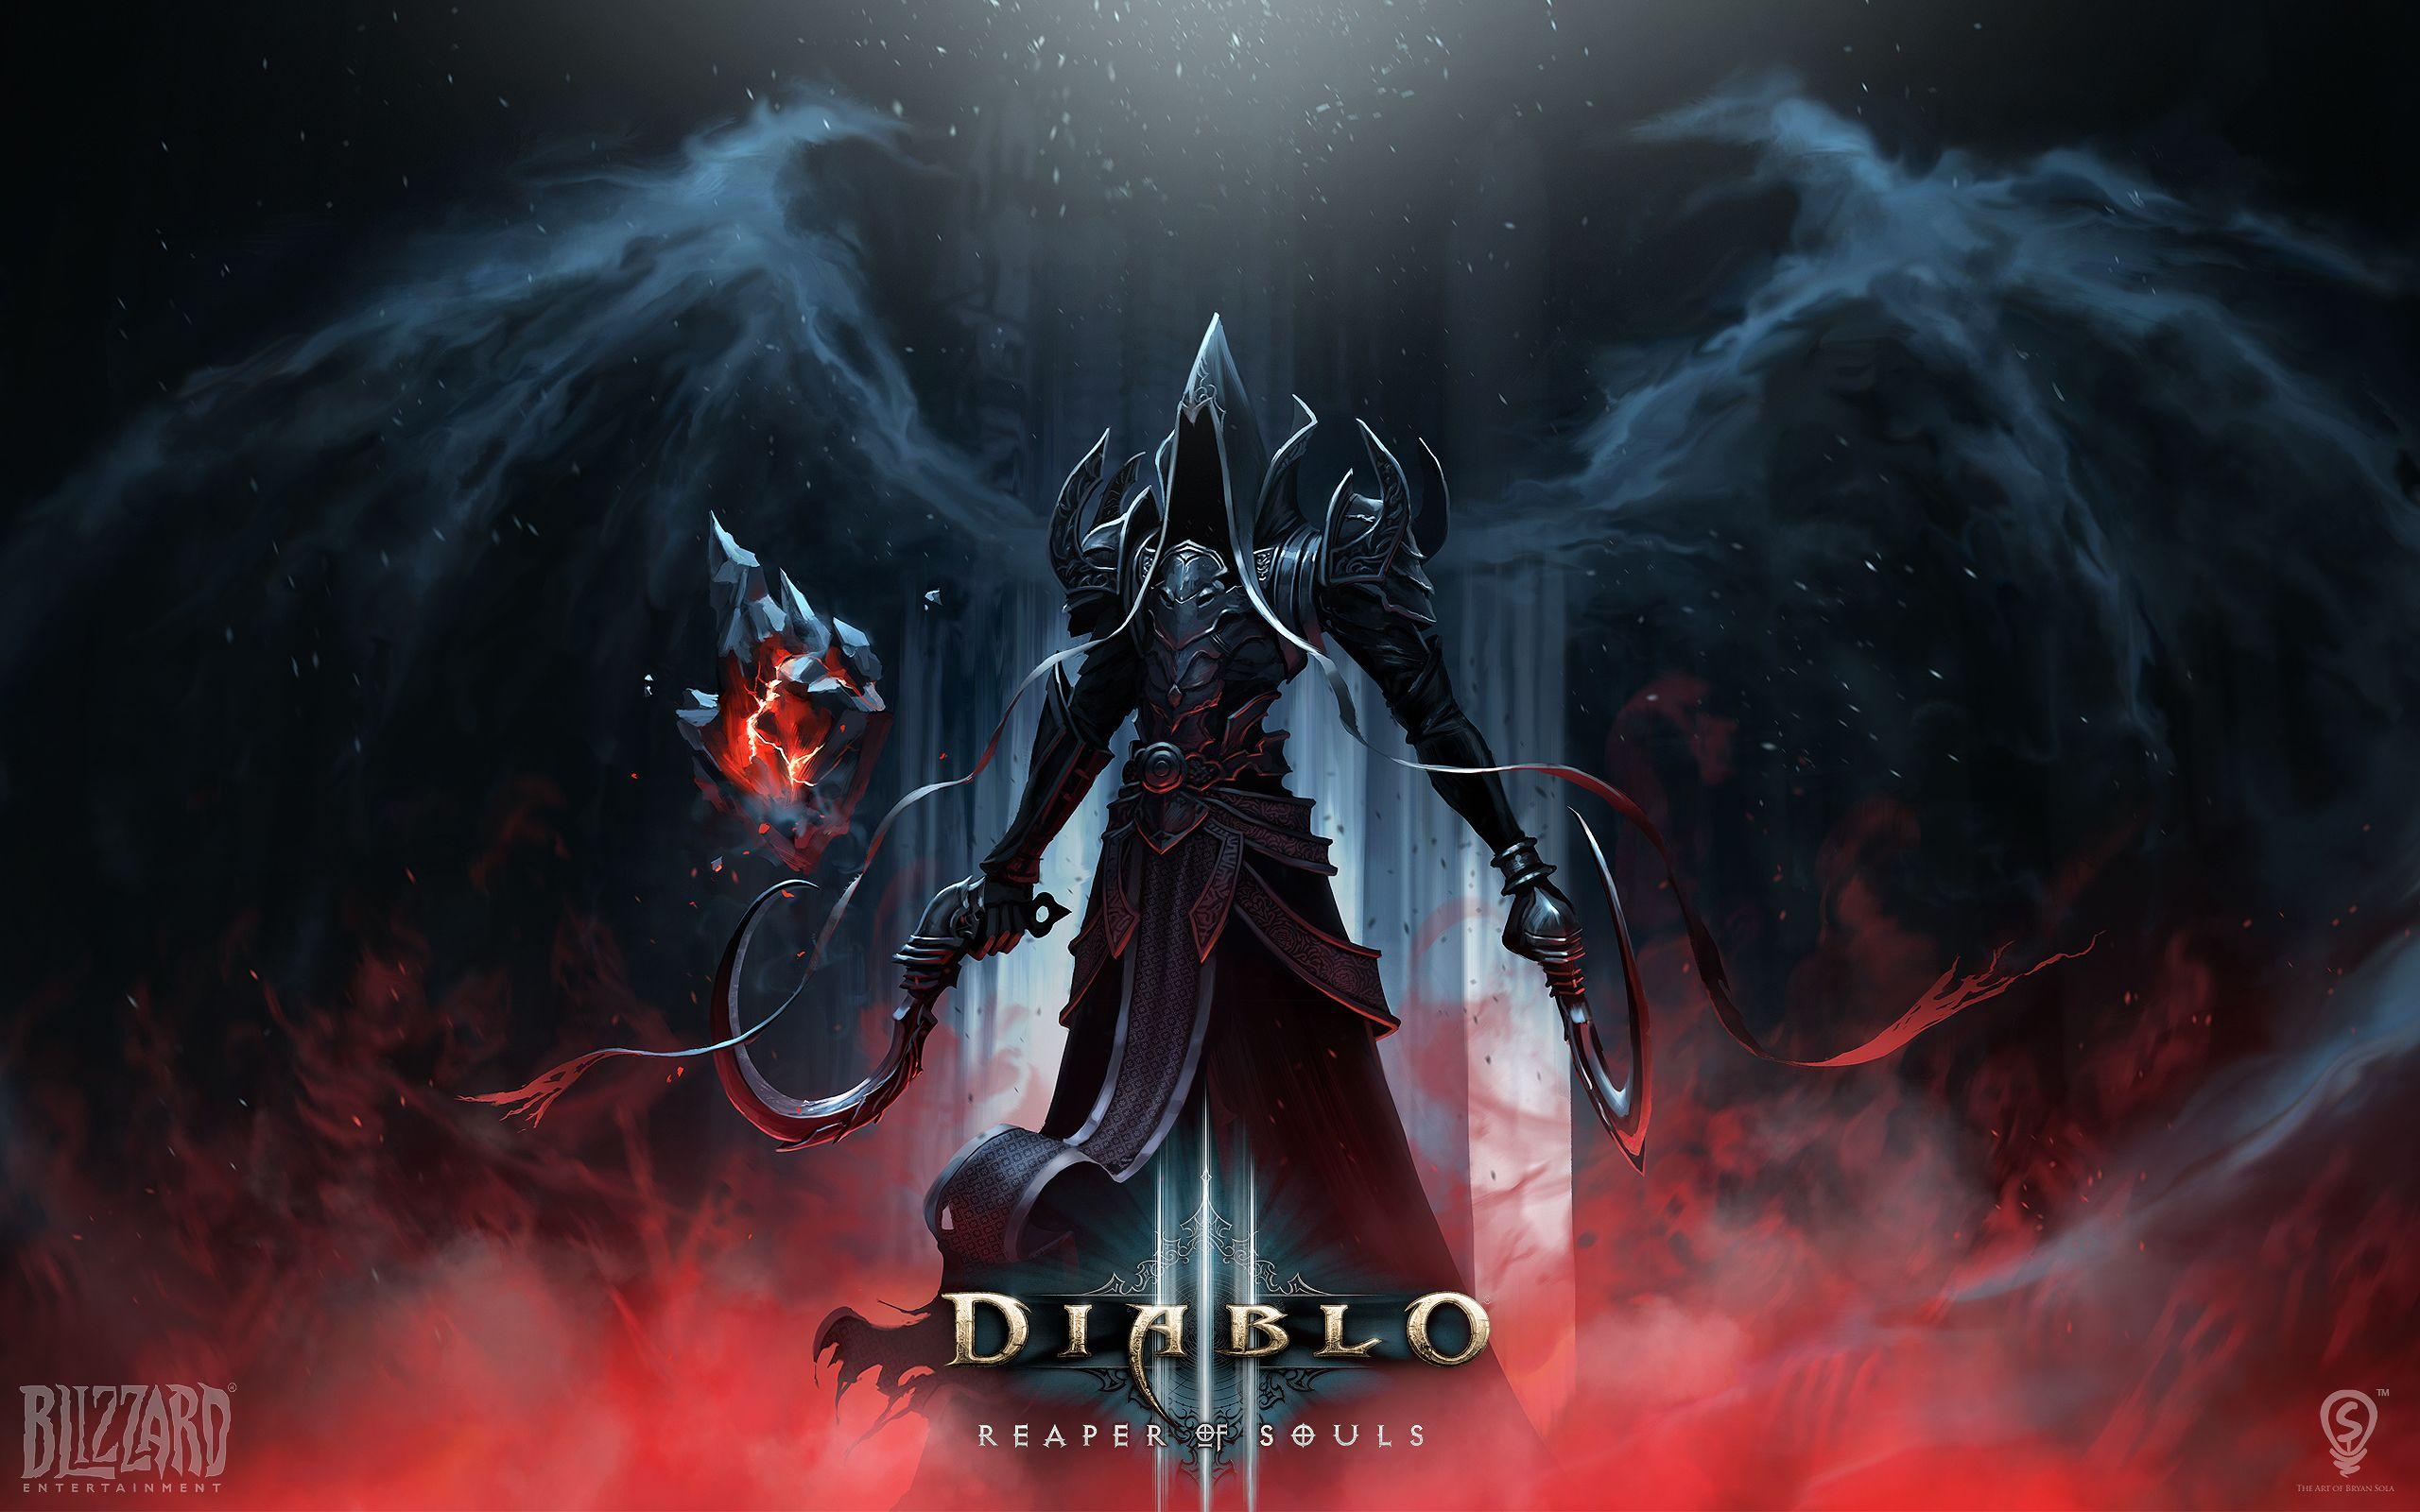 reaper_of_souls_blizzard_by_bpsola-d6ln8ar.jpg (2560×1600)